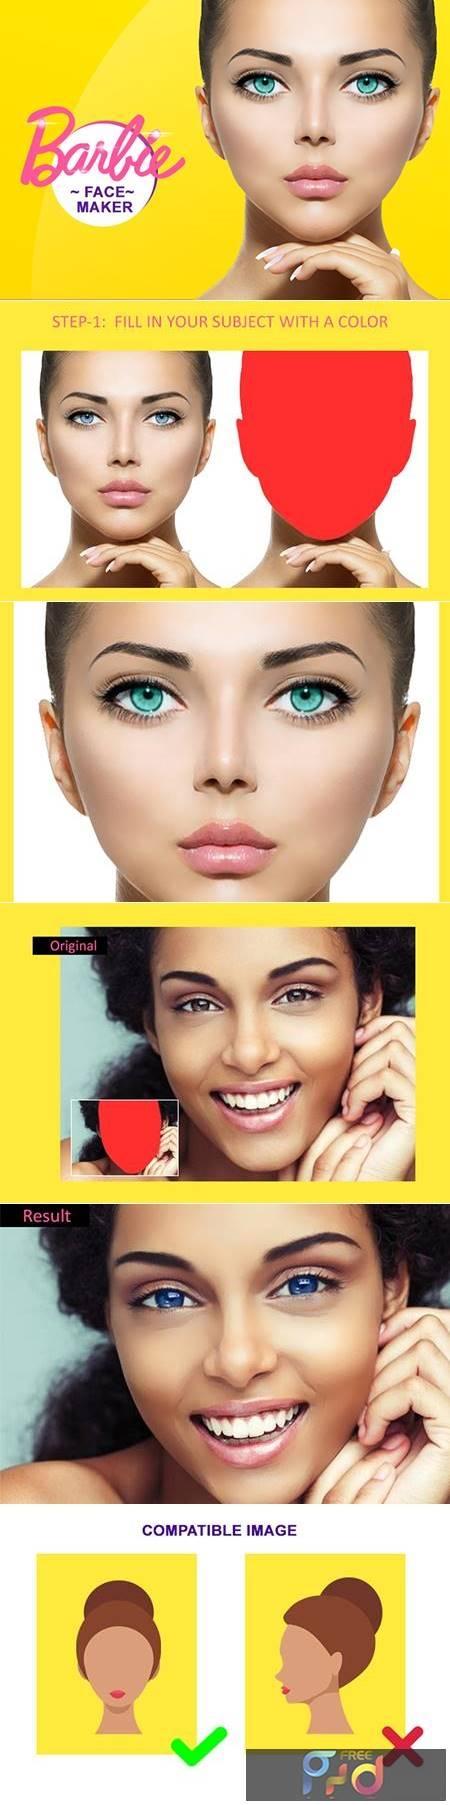 Barbie Face Maker PS Action 4871594 1